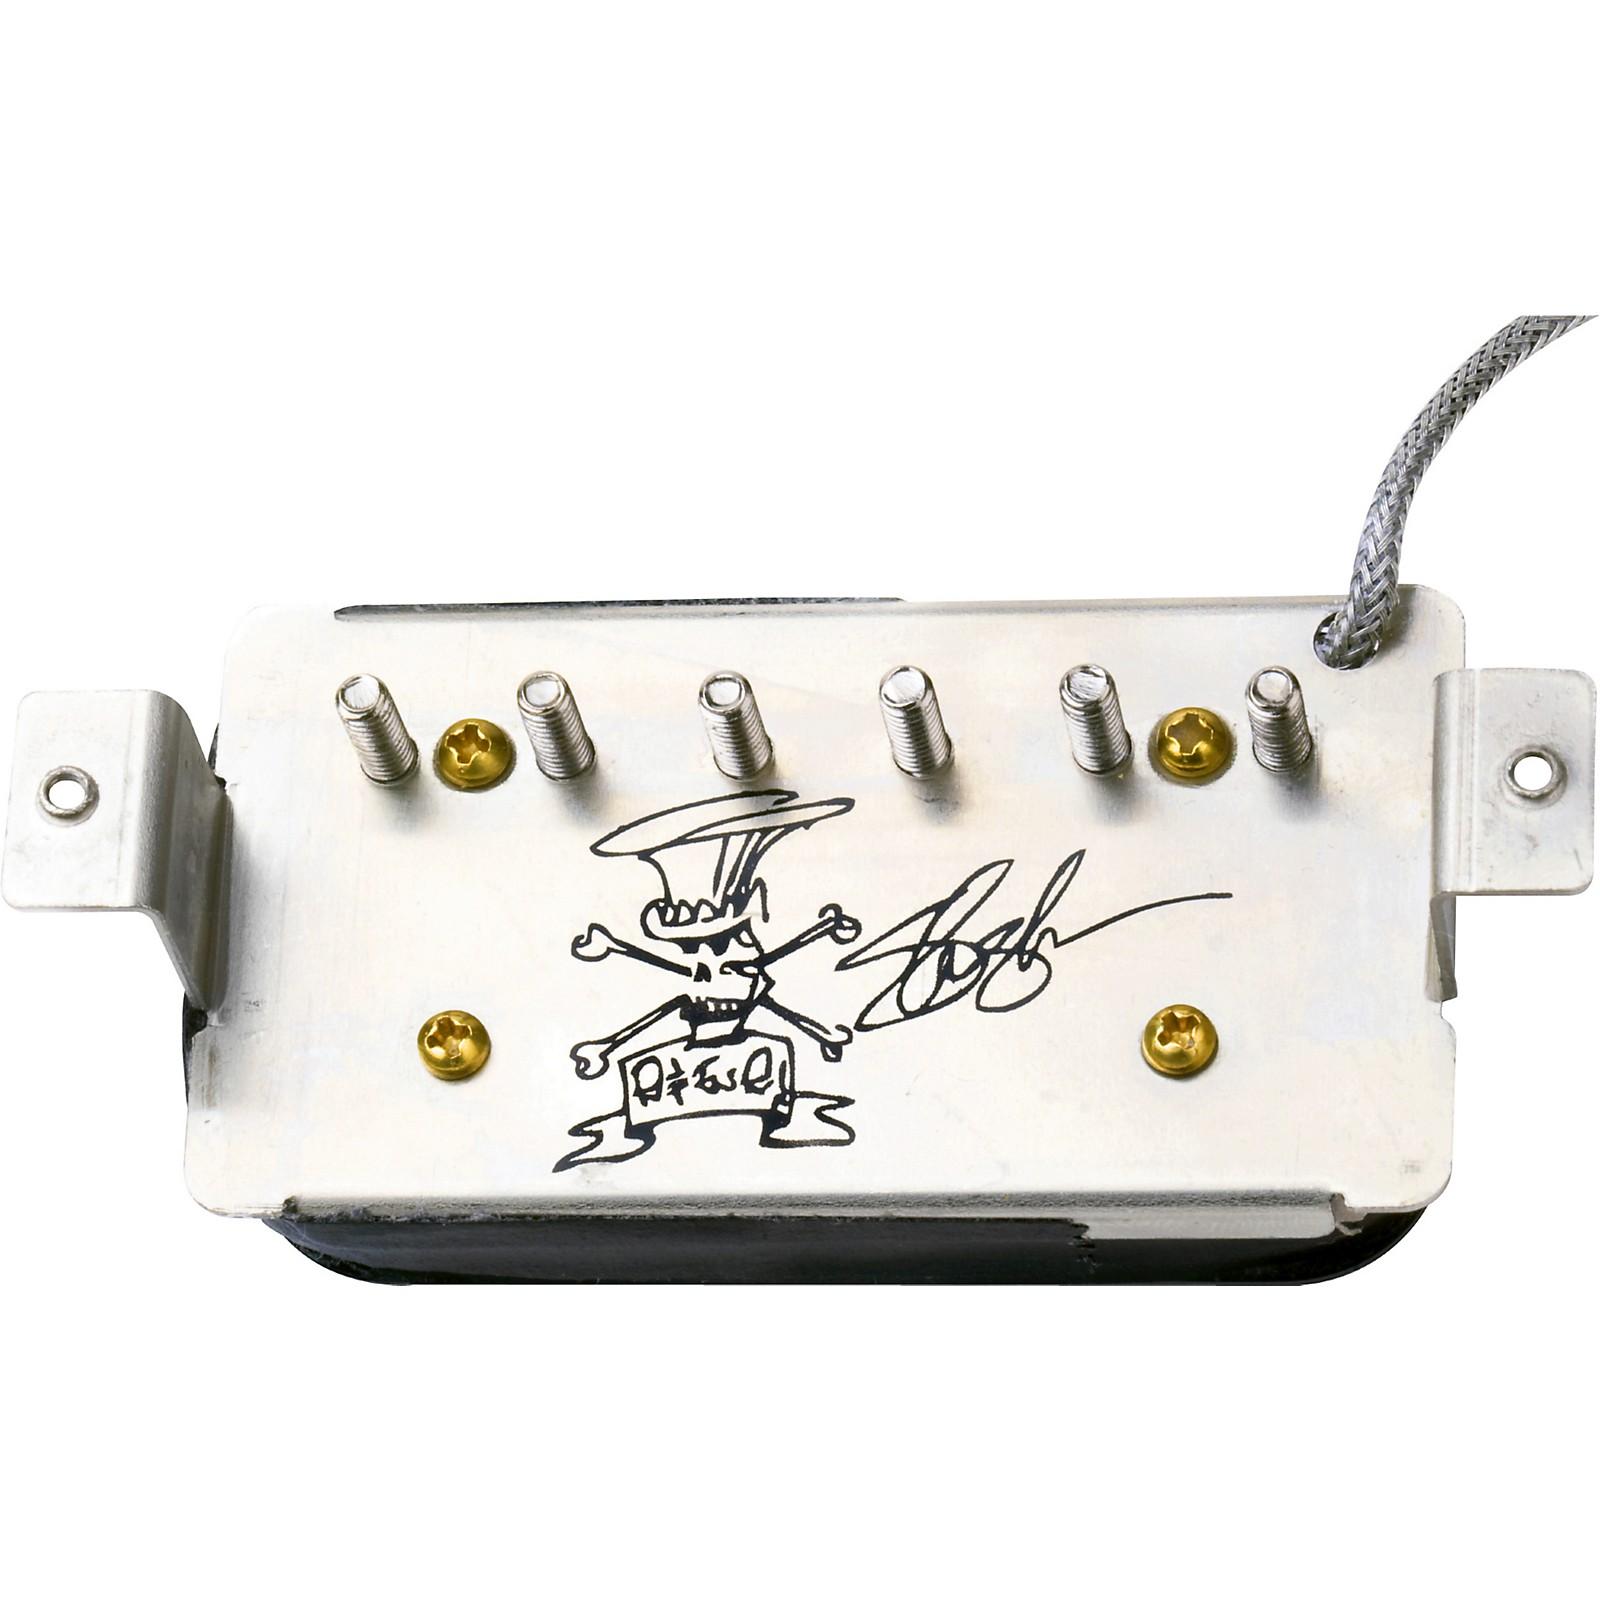 Seymour Duncan APH-2b Alnico II Pro Slash Bridge Humbucker Electric Guitar Bridge Pickup